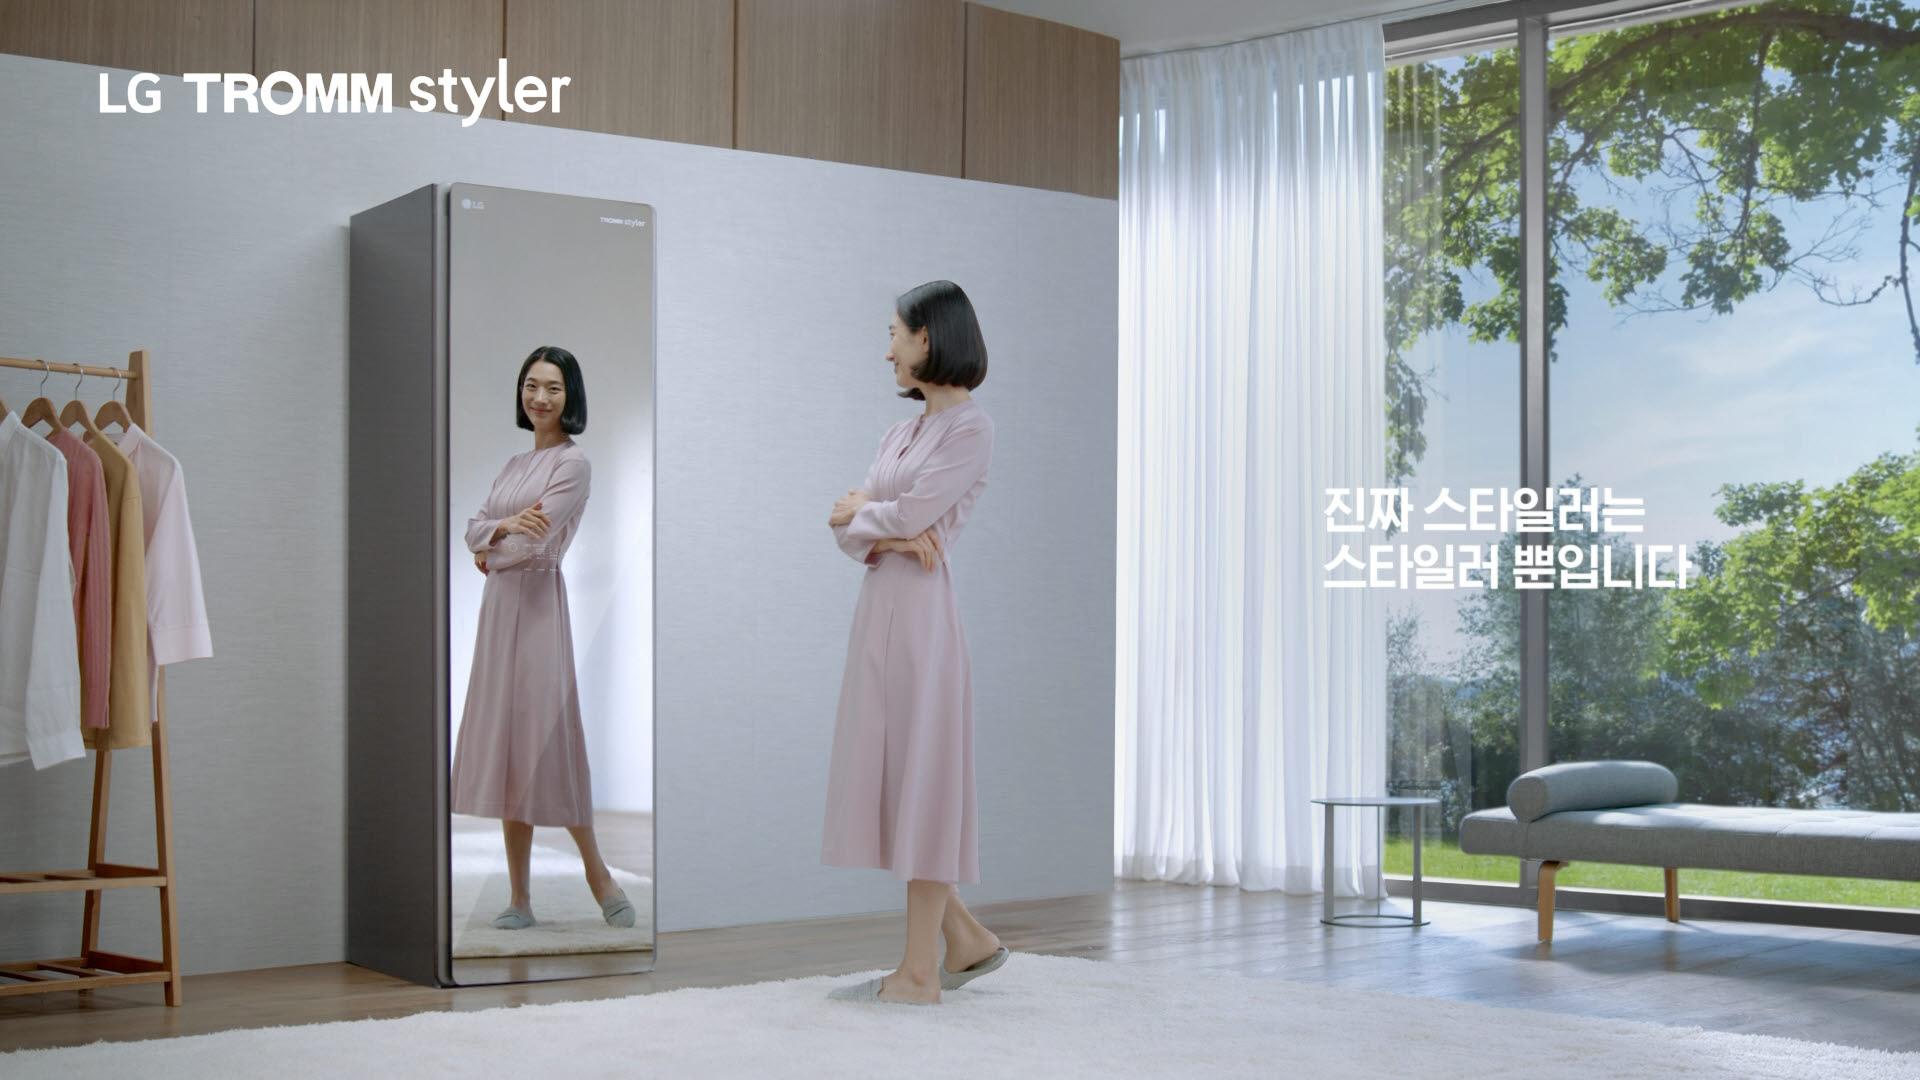 LG 트롬 스타일러 광고영상 캡처화면